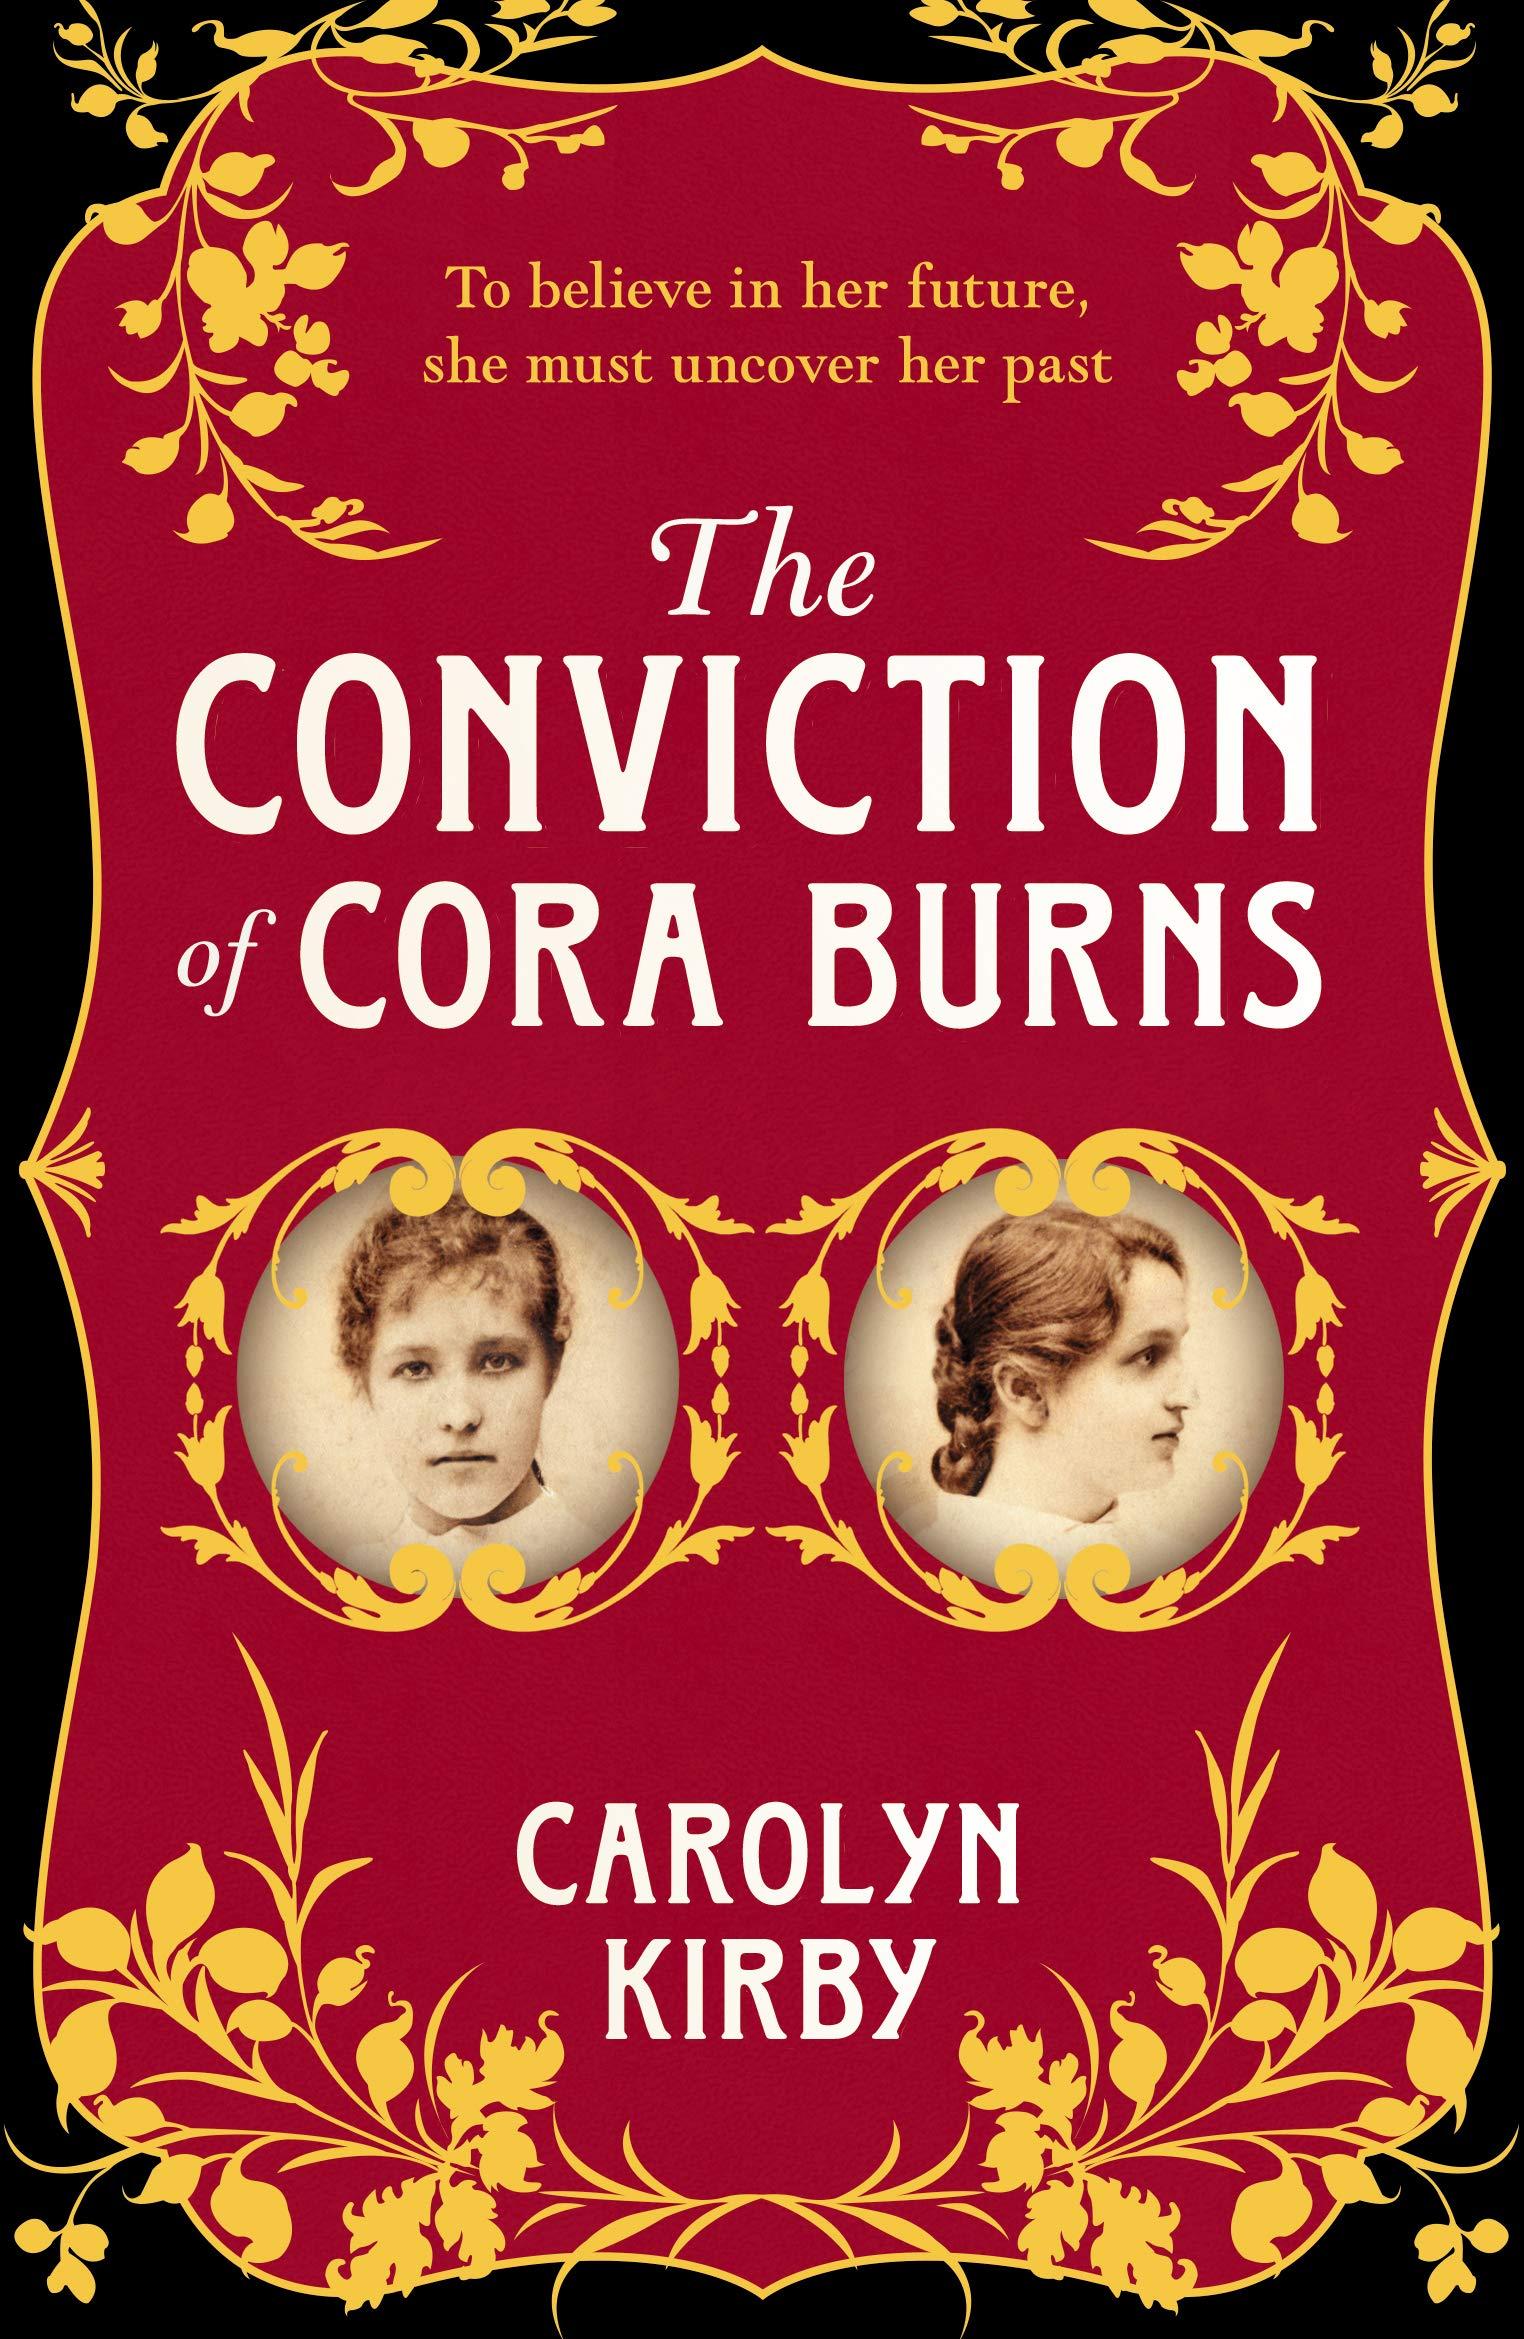 The Conviction of Cora Burns: Amazon.co.uk: Carolyn Kirby: 9780857302946:  Books